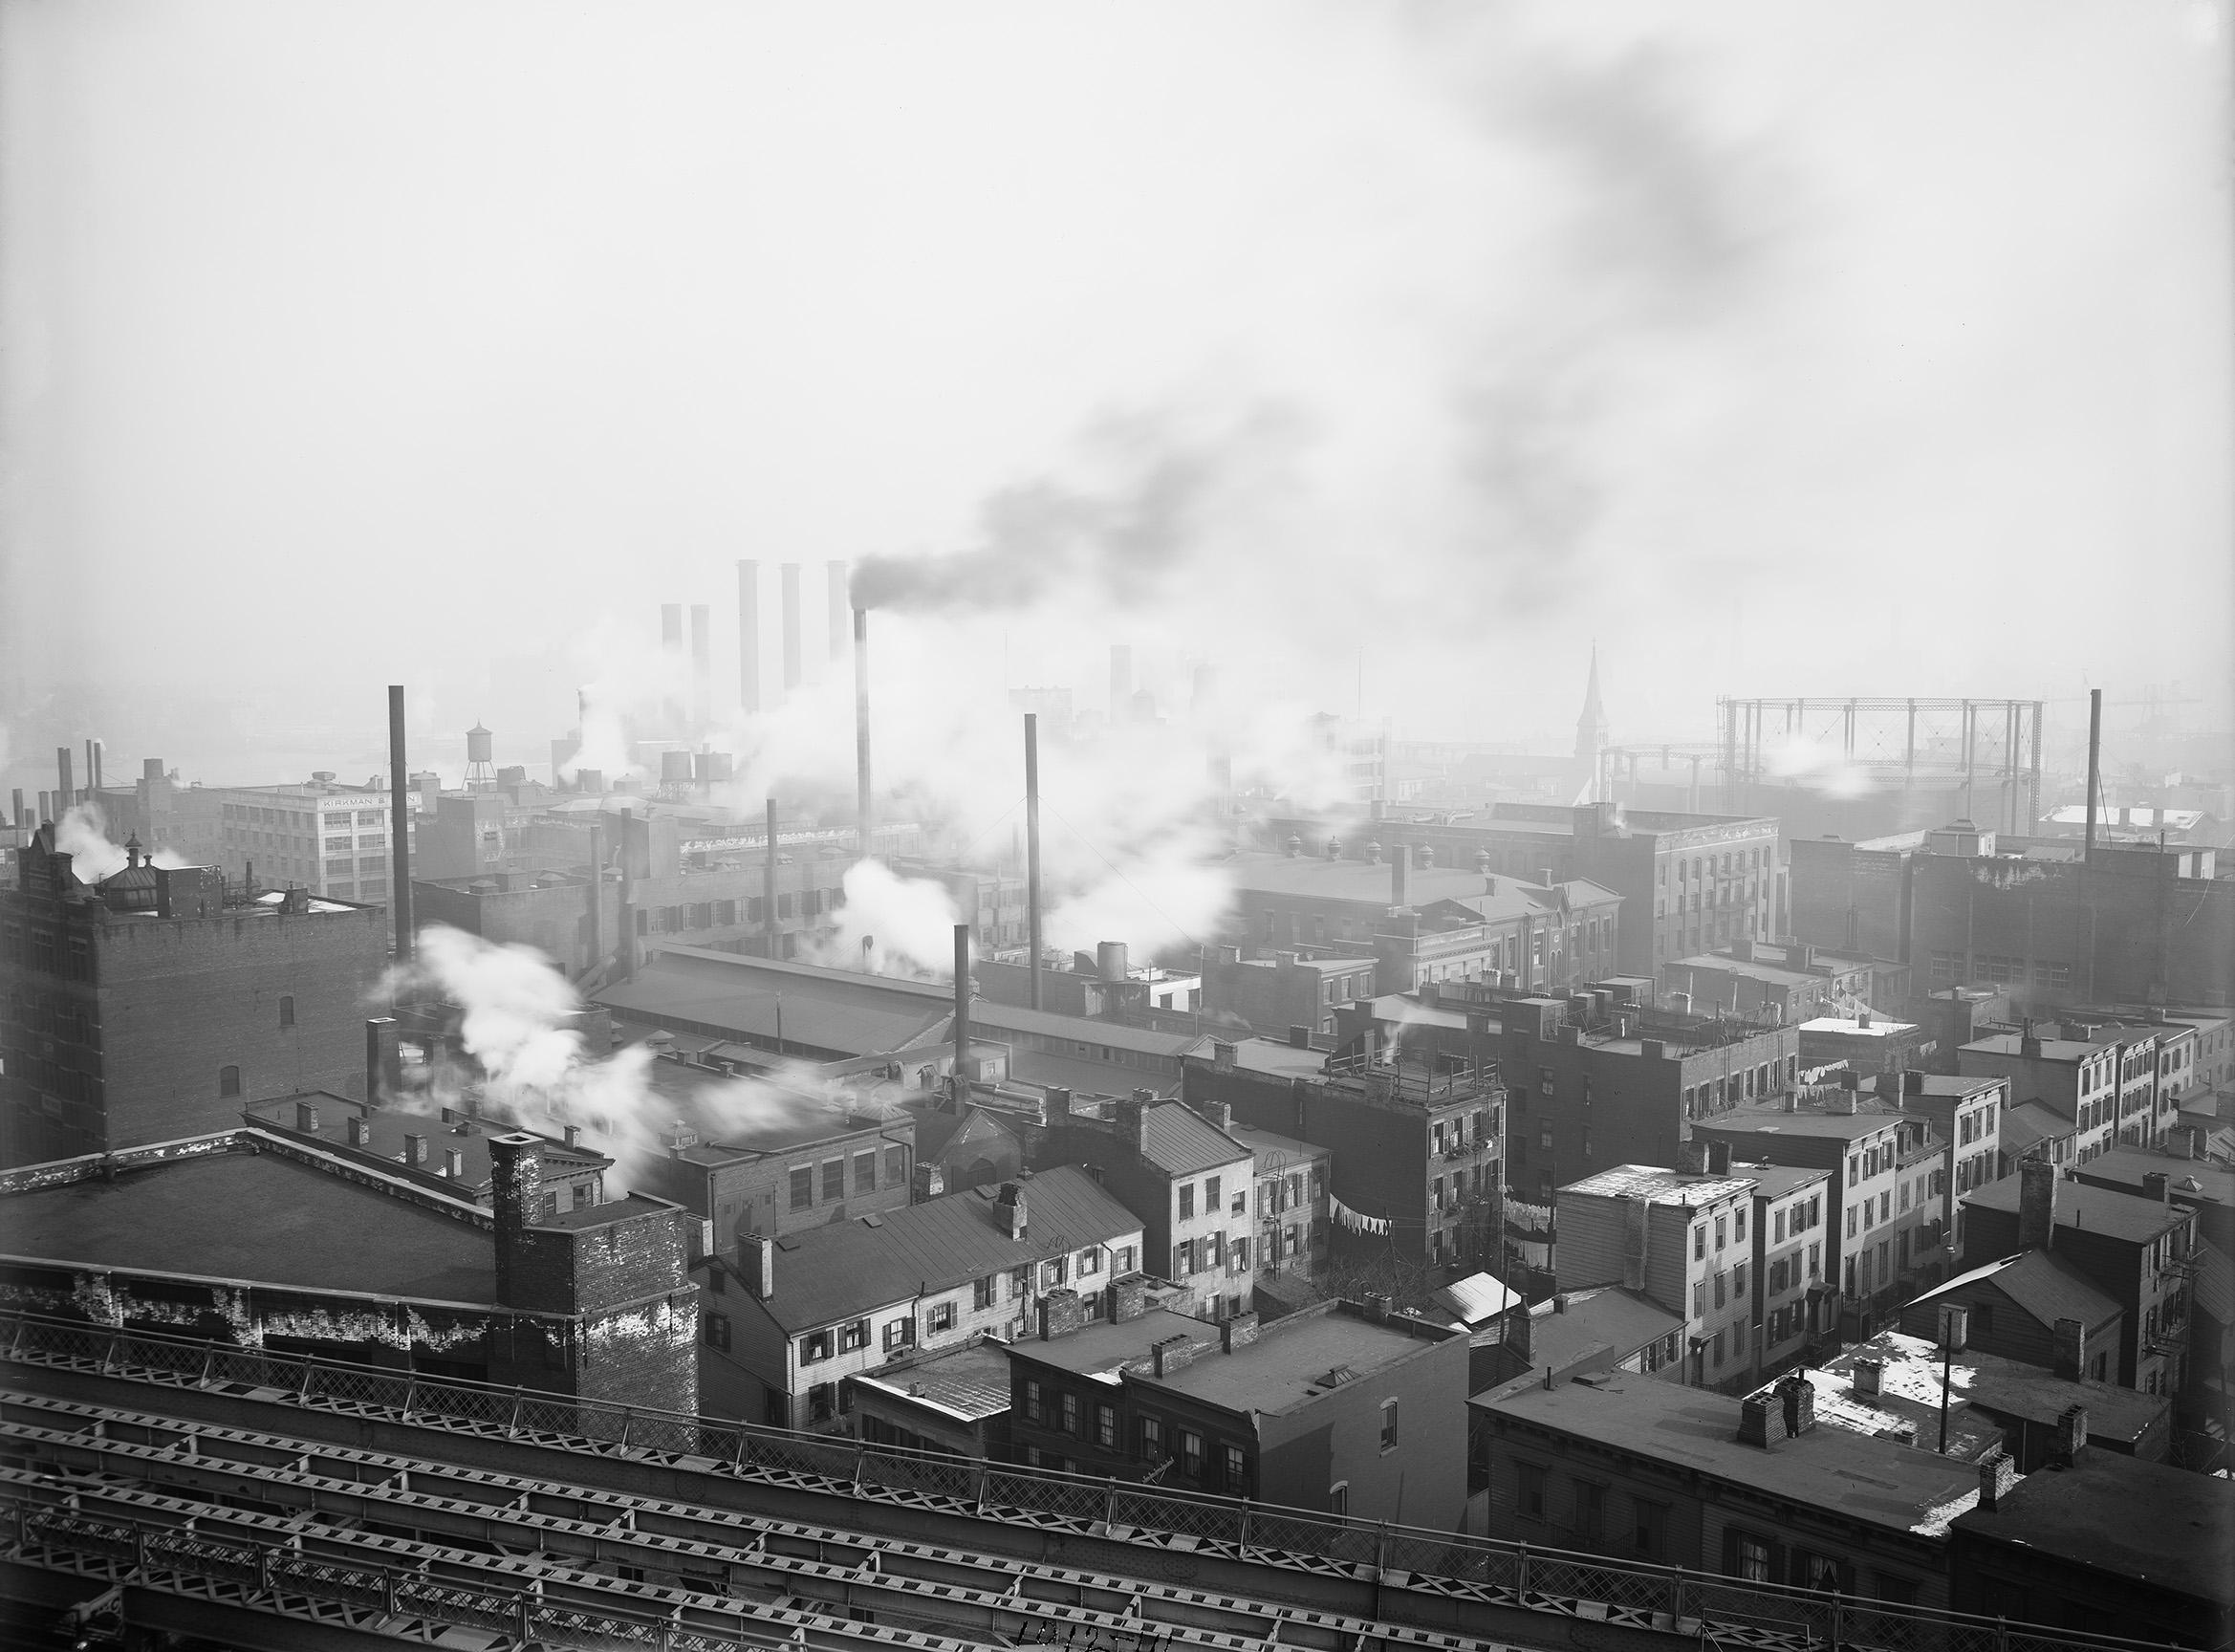 York and Jay Street from the Manhattan Bridge, Eugene de Salignac, January 4, 1912